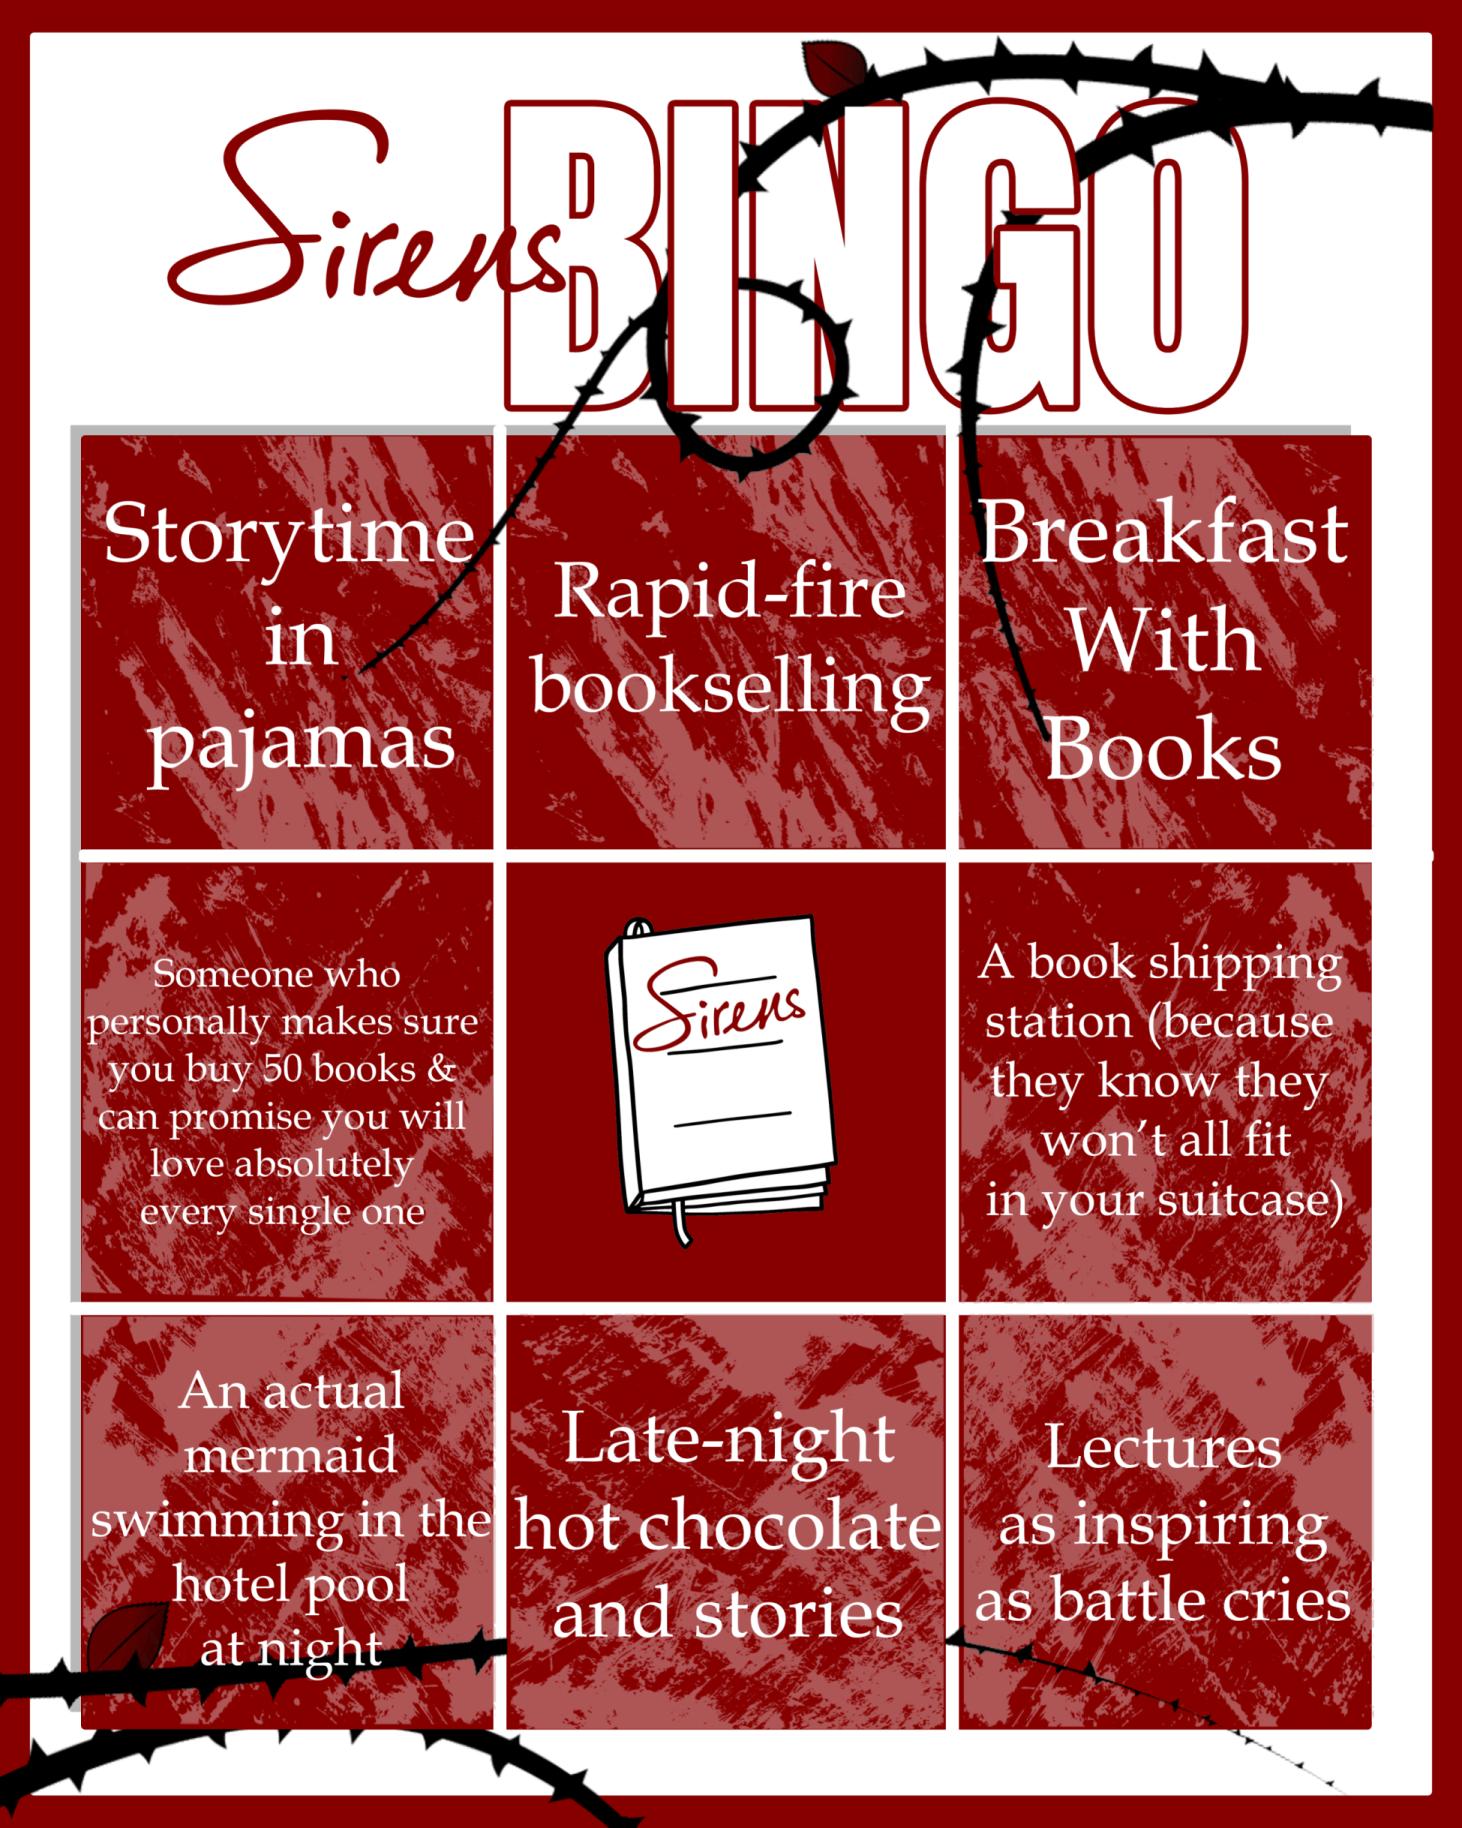 Sirens conference bingo